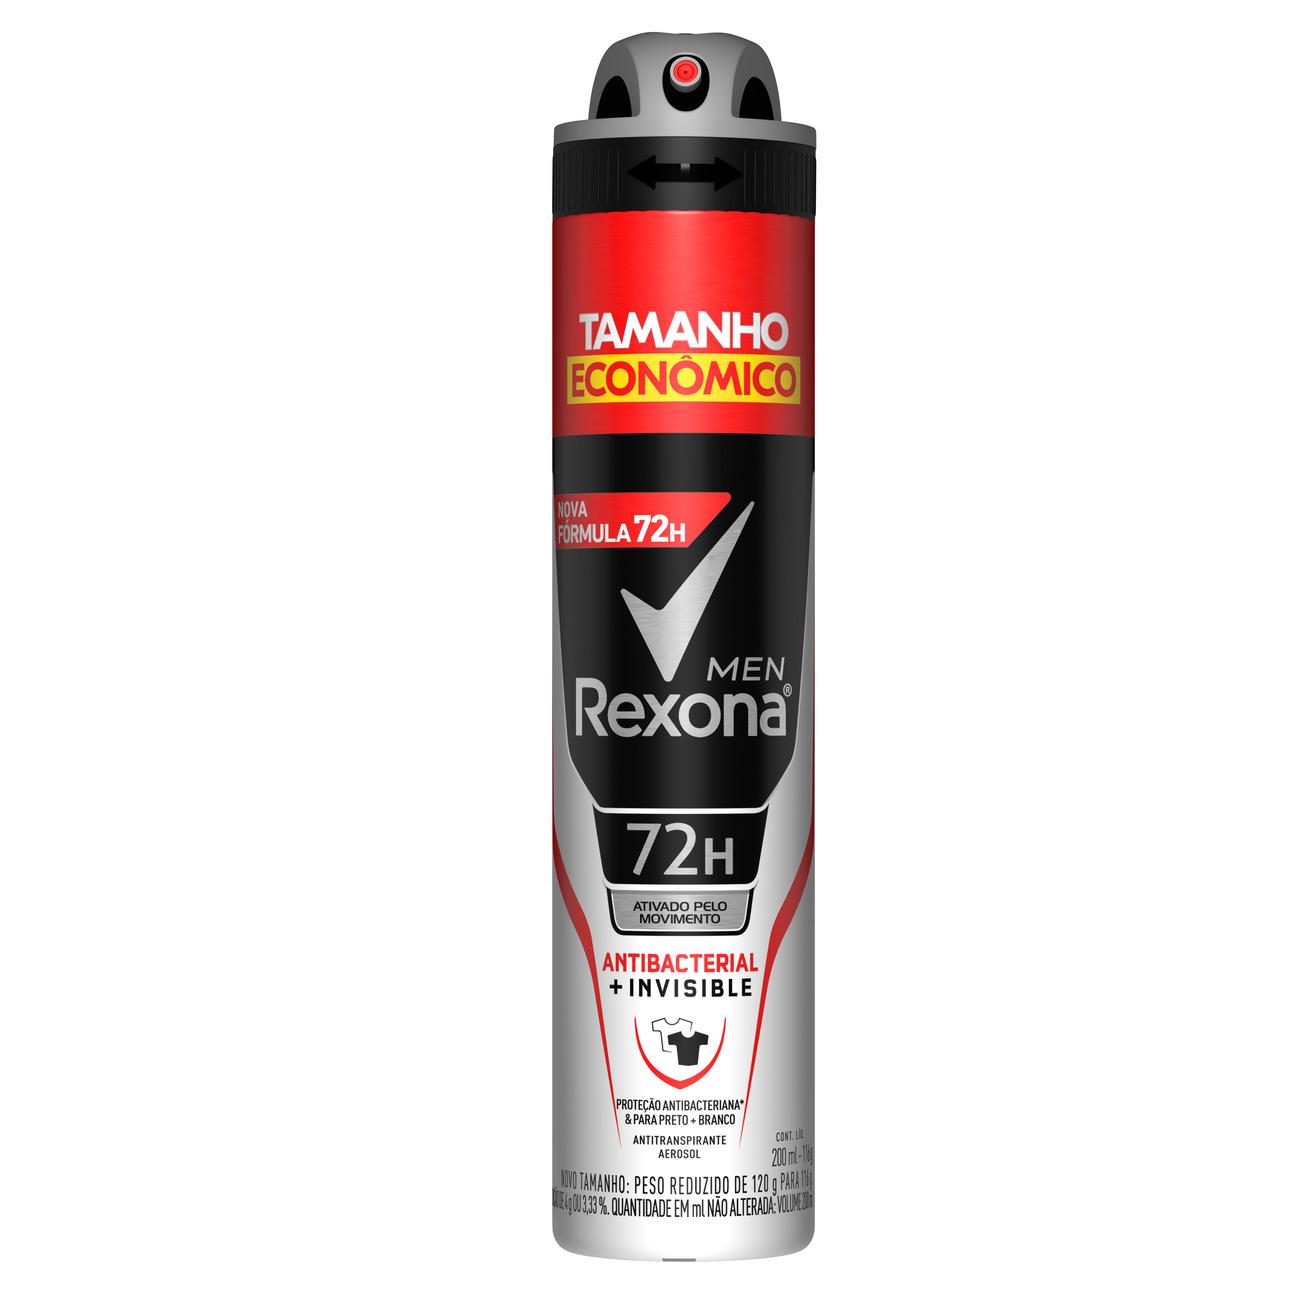 Desodorante Aerosol Antitranspirante Rexona Men Antibacterial + Invisible 72 horas 200mL